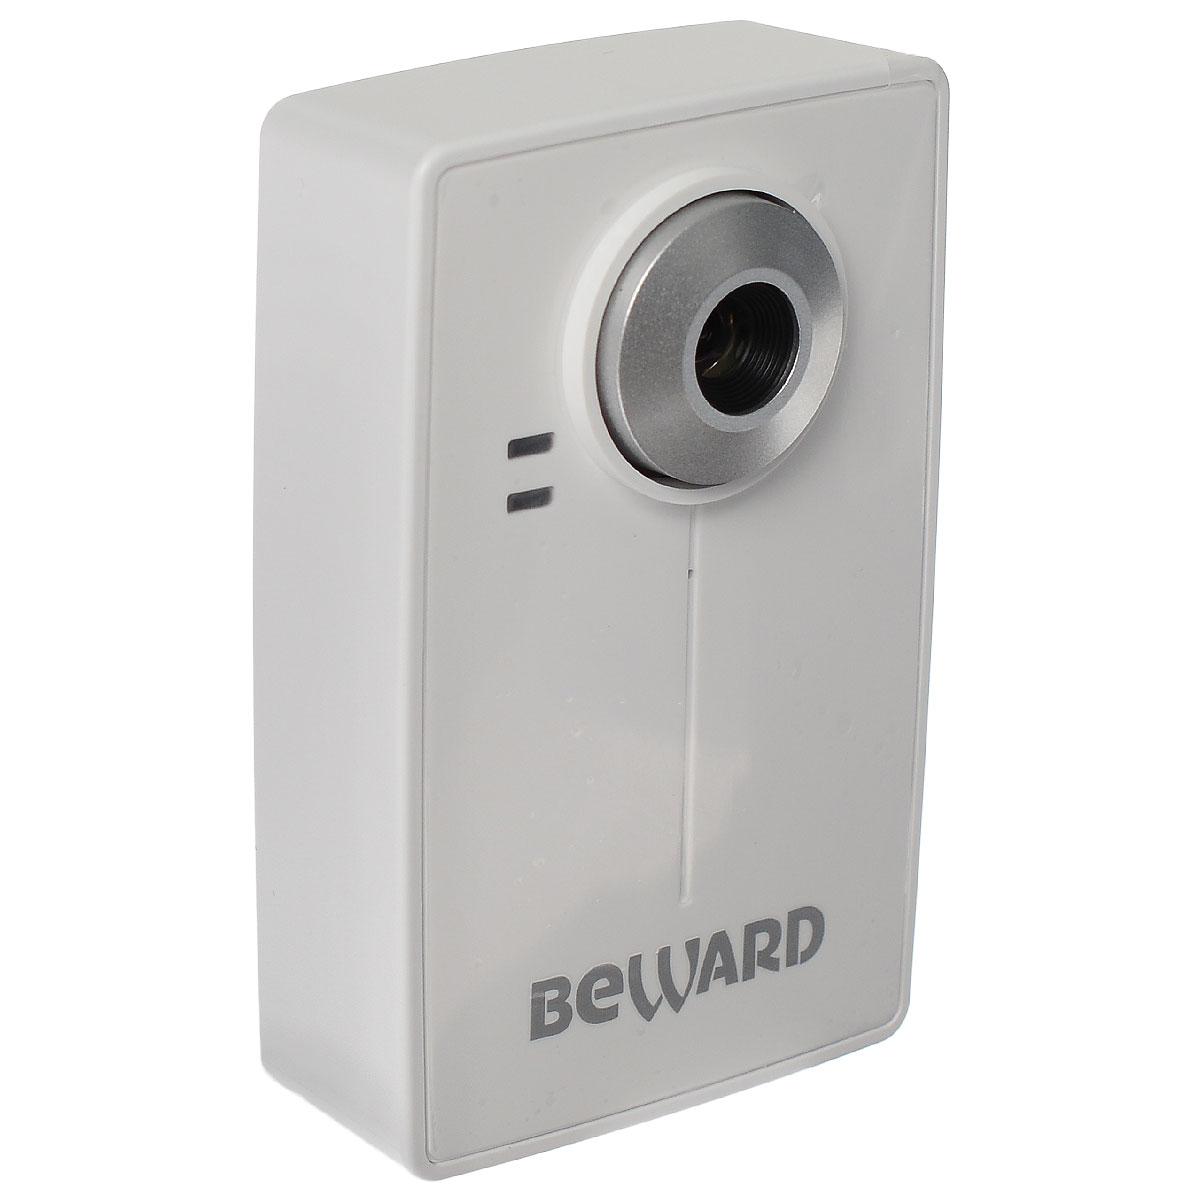 Beward N13103, White IP-камера ( N13103 )